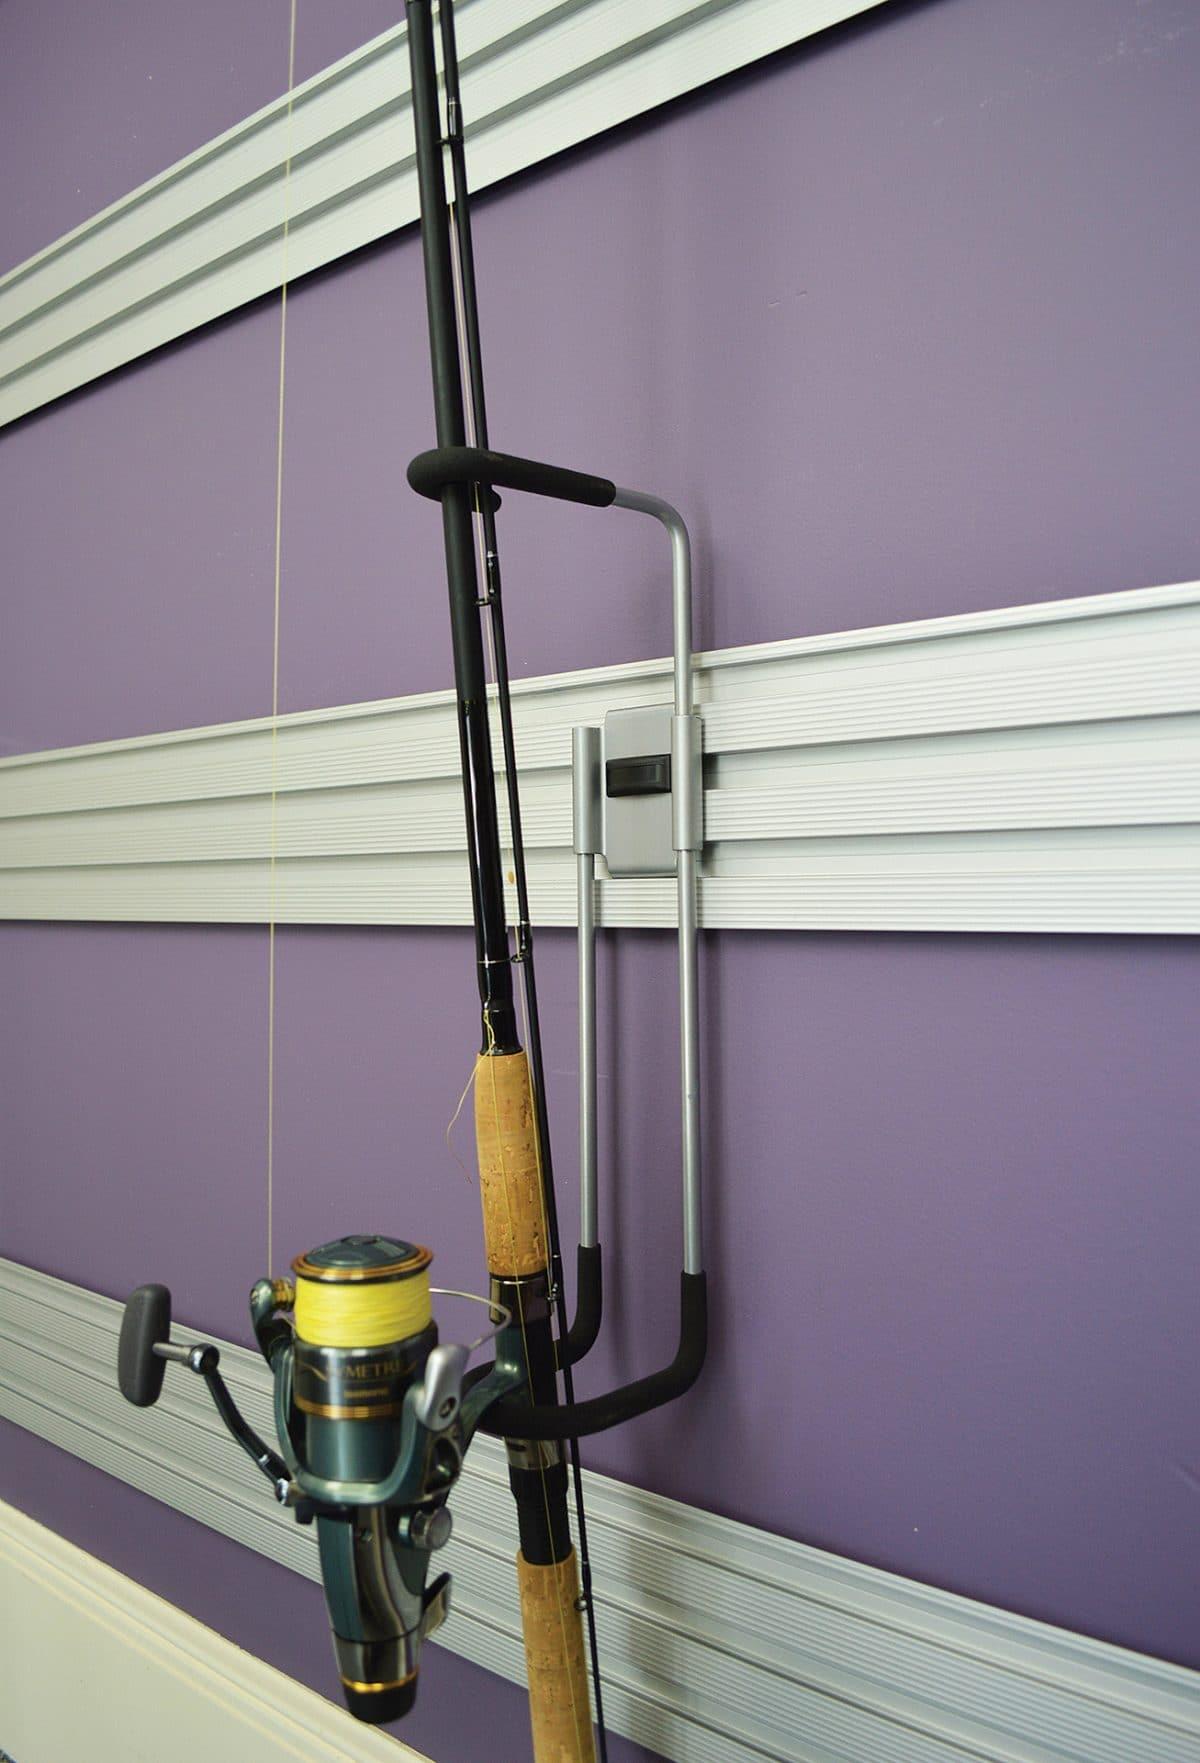 Garage accessories phoenix az garage cabinet installers for Garage door fishing rod holder